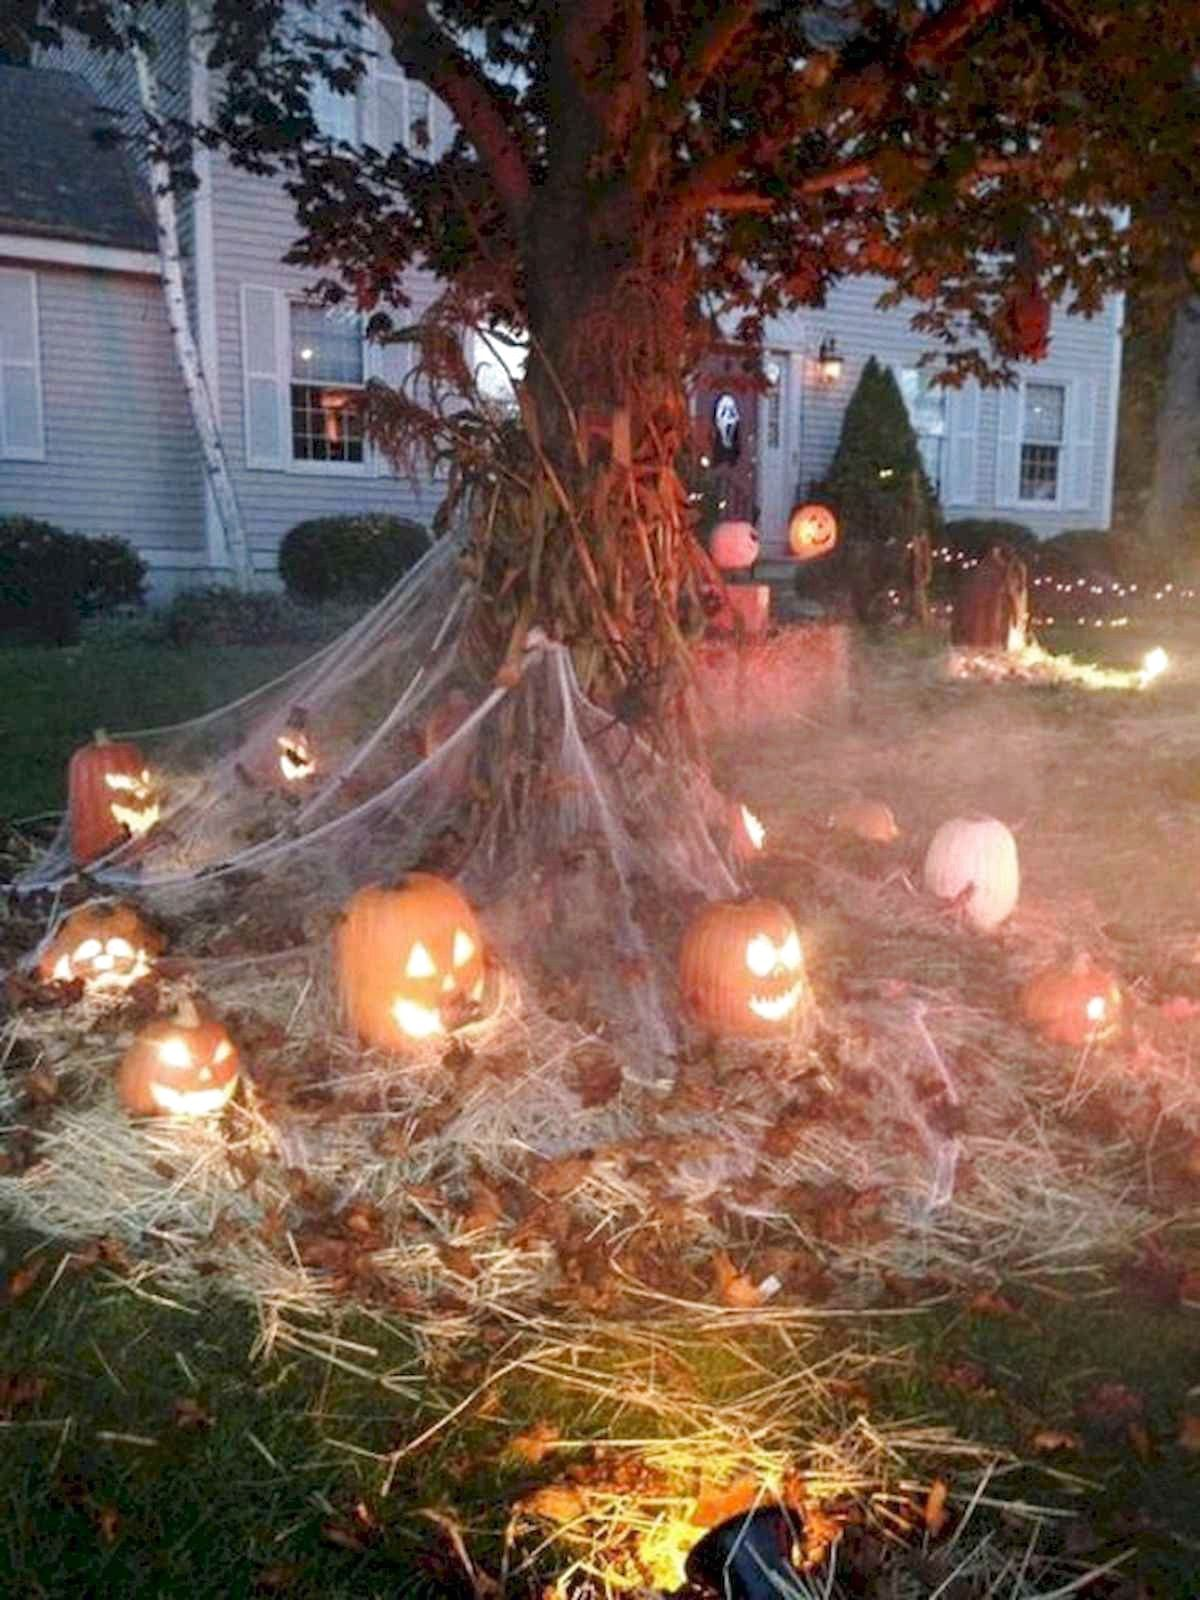 62 Favourite Diy Halloween Decorations Ideas The Expert Beautiful Ideas Scary Halloween Decorations Outdoor Scary Halloween Decorations Diy Halloween Decorations Outdoor Porch